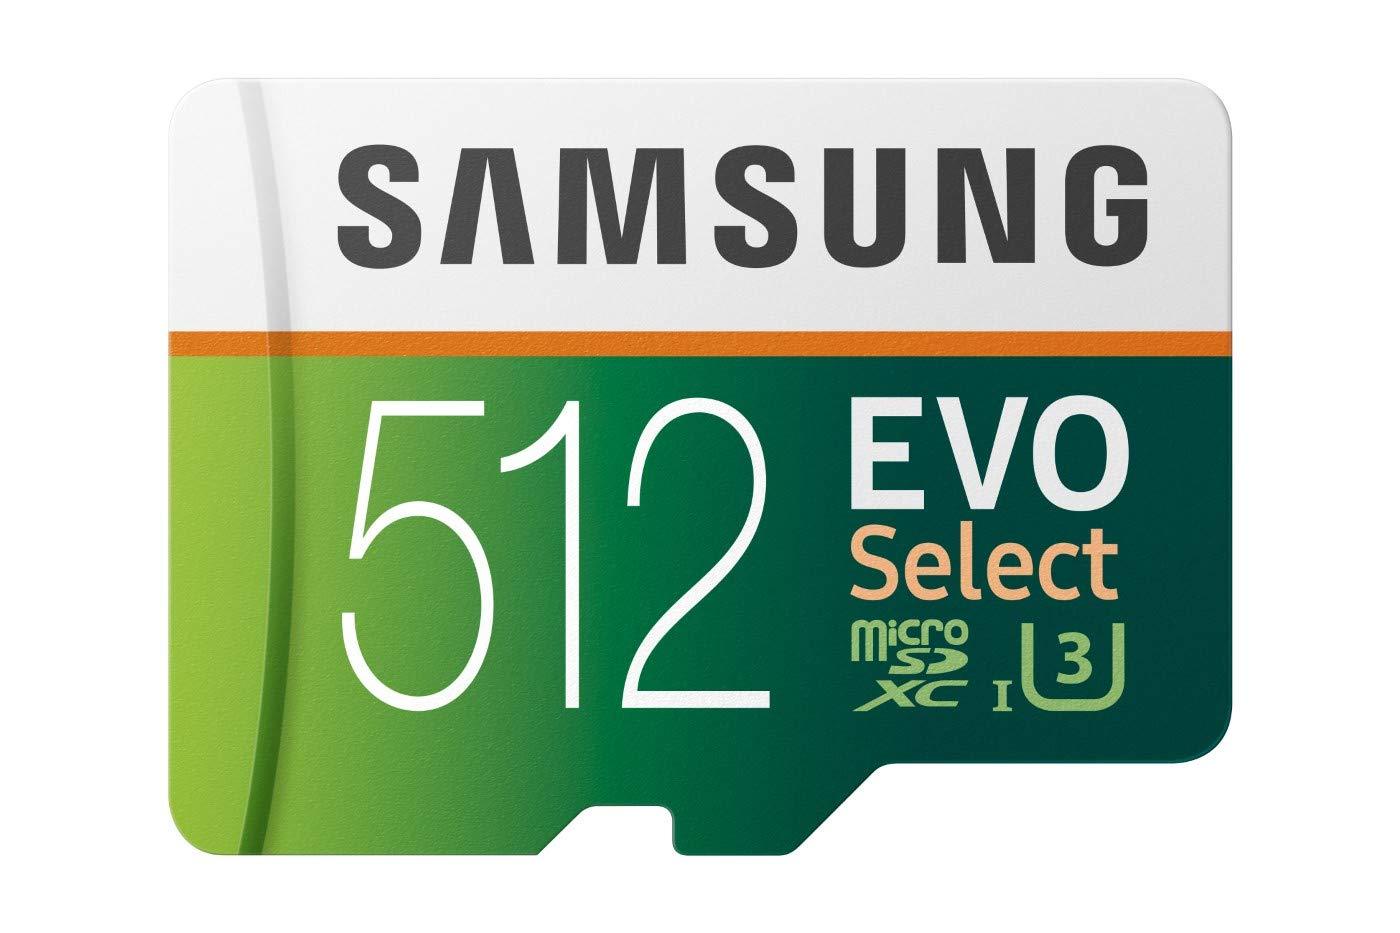 Samsung EVO Select 512 GB microSDXC Up to 100MB/s, Class 10 UHS-I U3, 4K Video + Adapter £86.49 (£66.49 with Samsung Cashback) @ Amazon